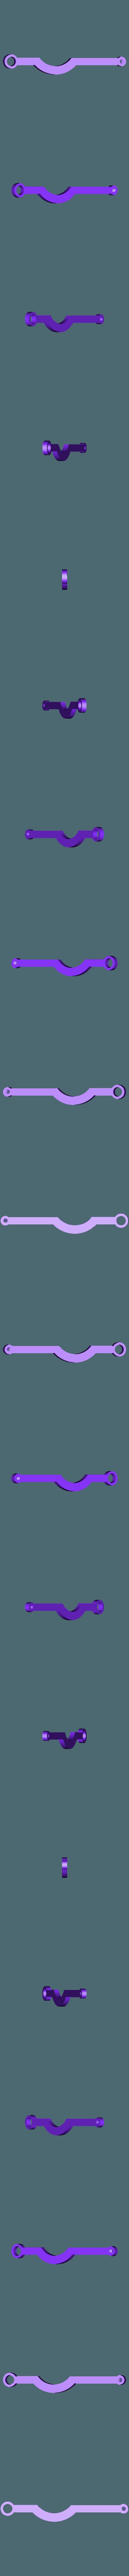 Arm_CE.stl Download free STL file Marblevator, Mechanisms • Object to 3D print, gzumwalt